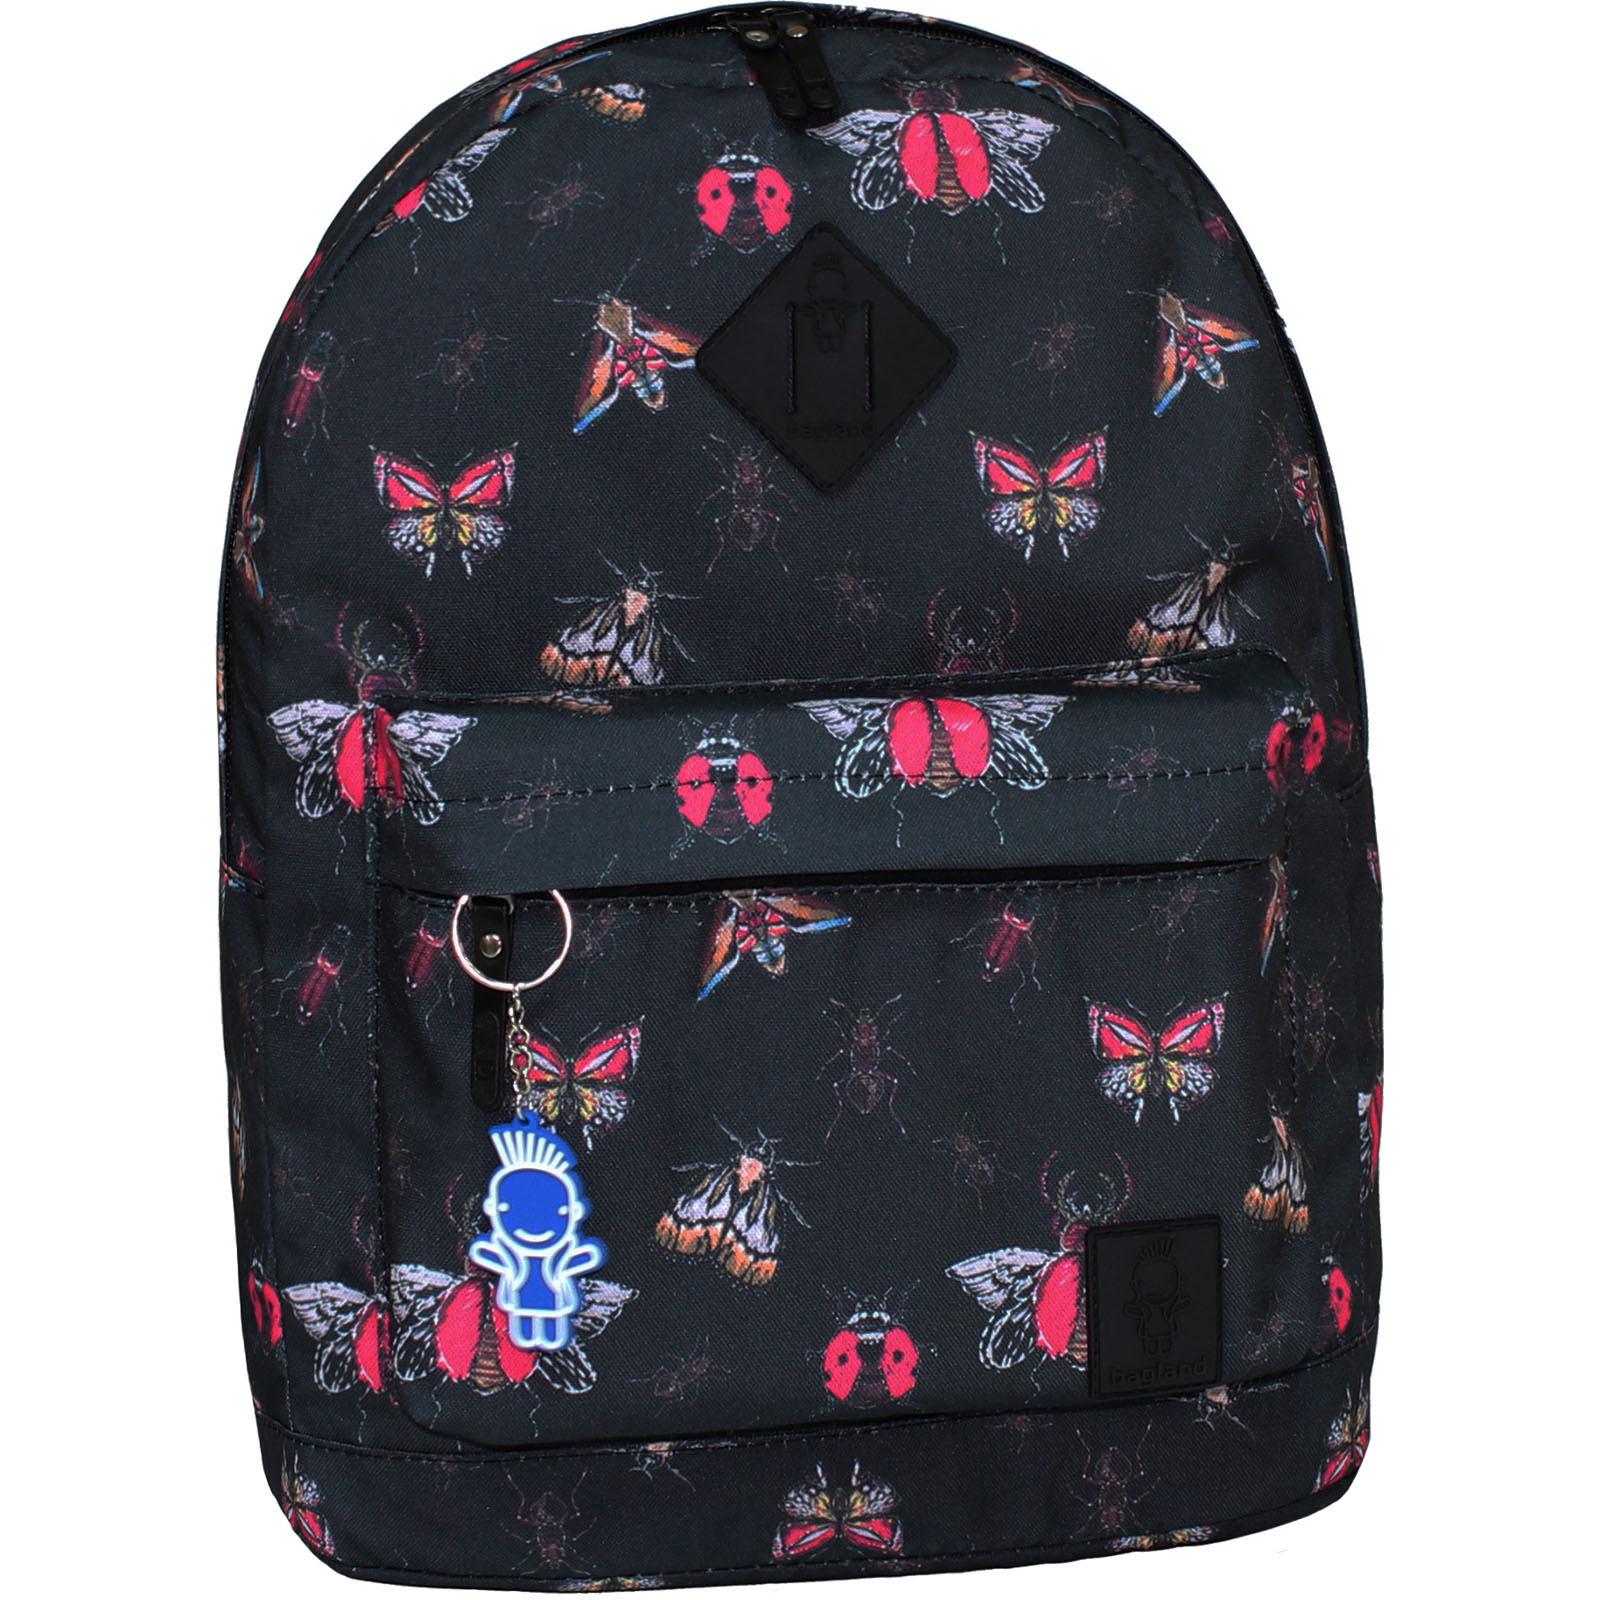 Городские рюкзаки Рюкзак Bagland Молодежный (дизайн) 17 л. сублимация 154 (00533664) IMG_6998_154.JPG